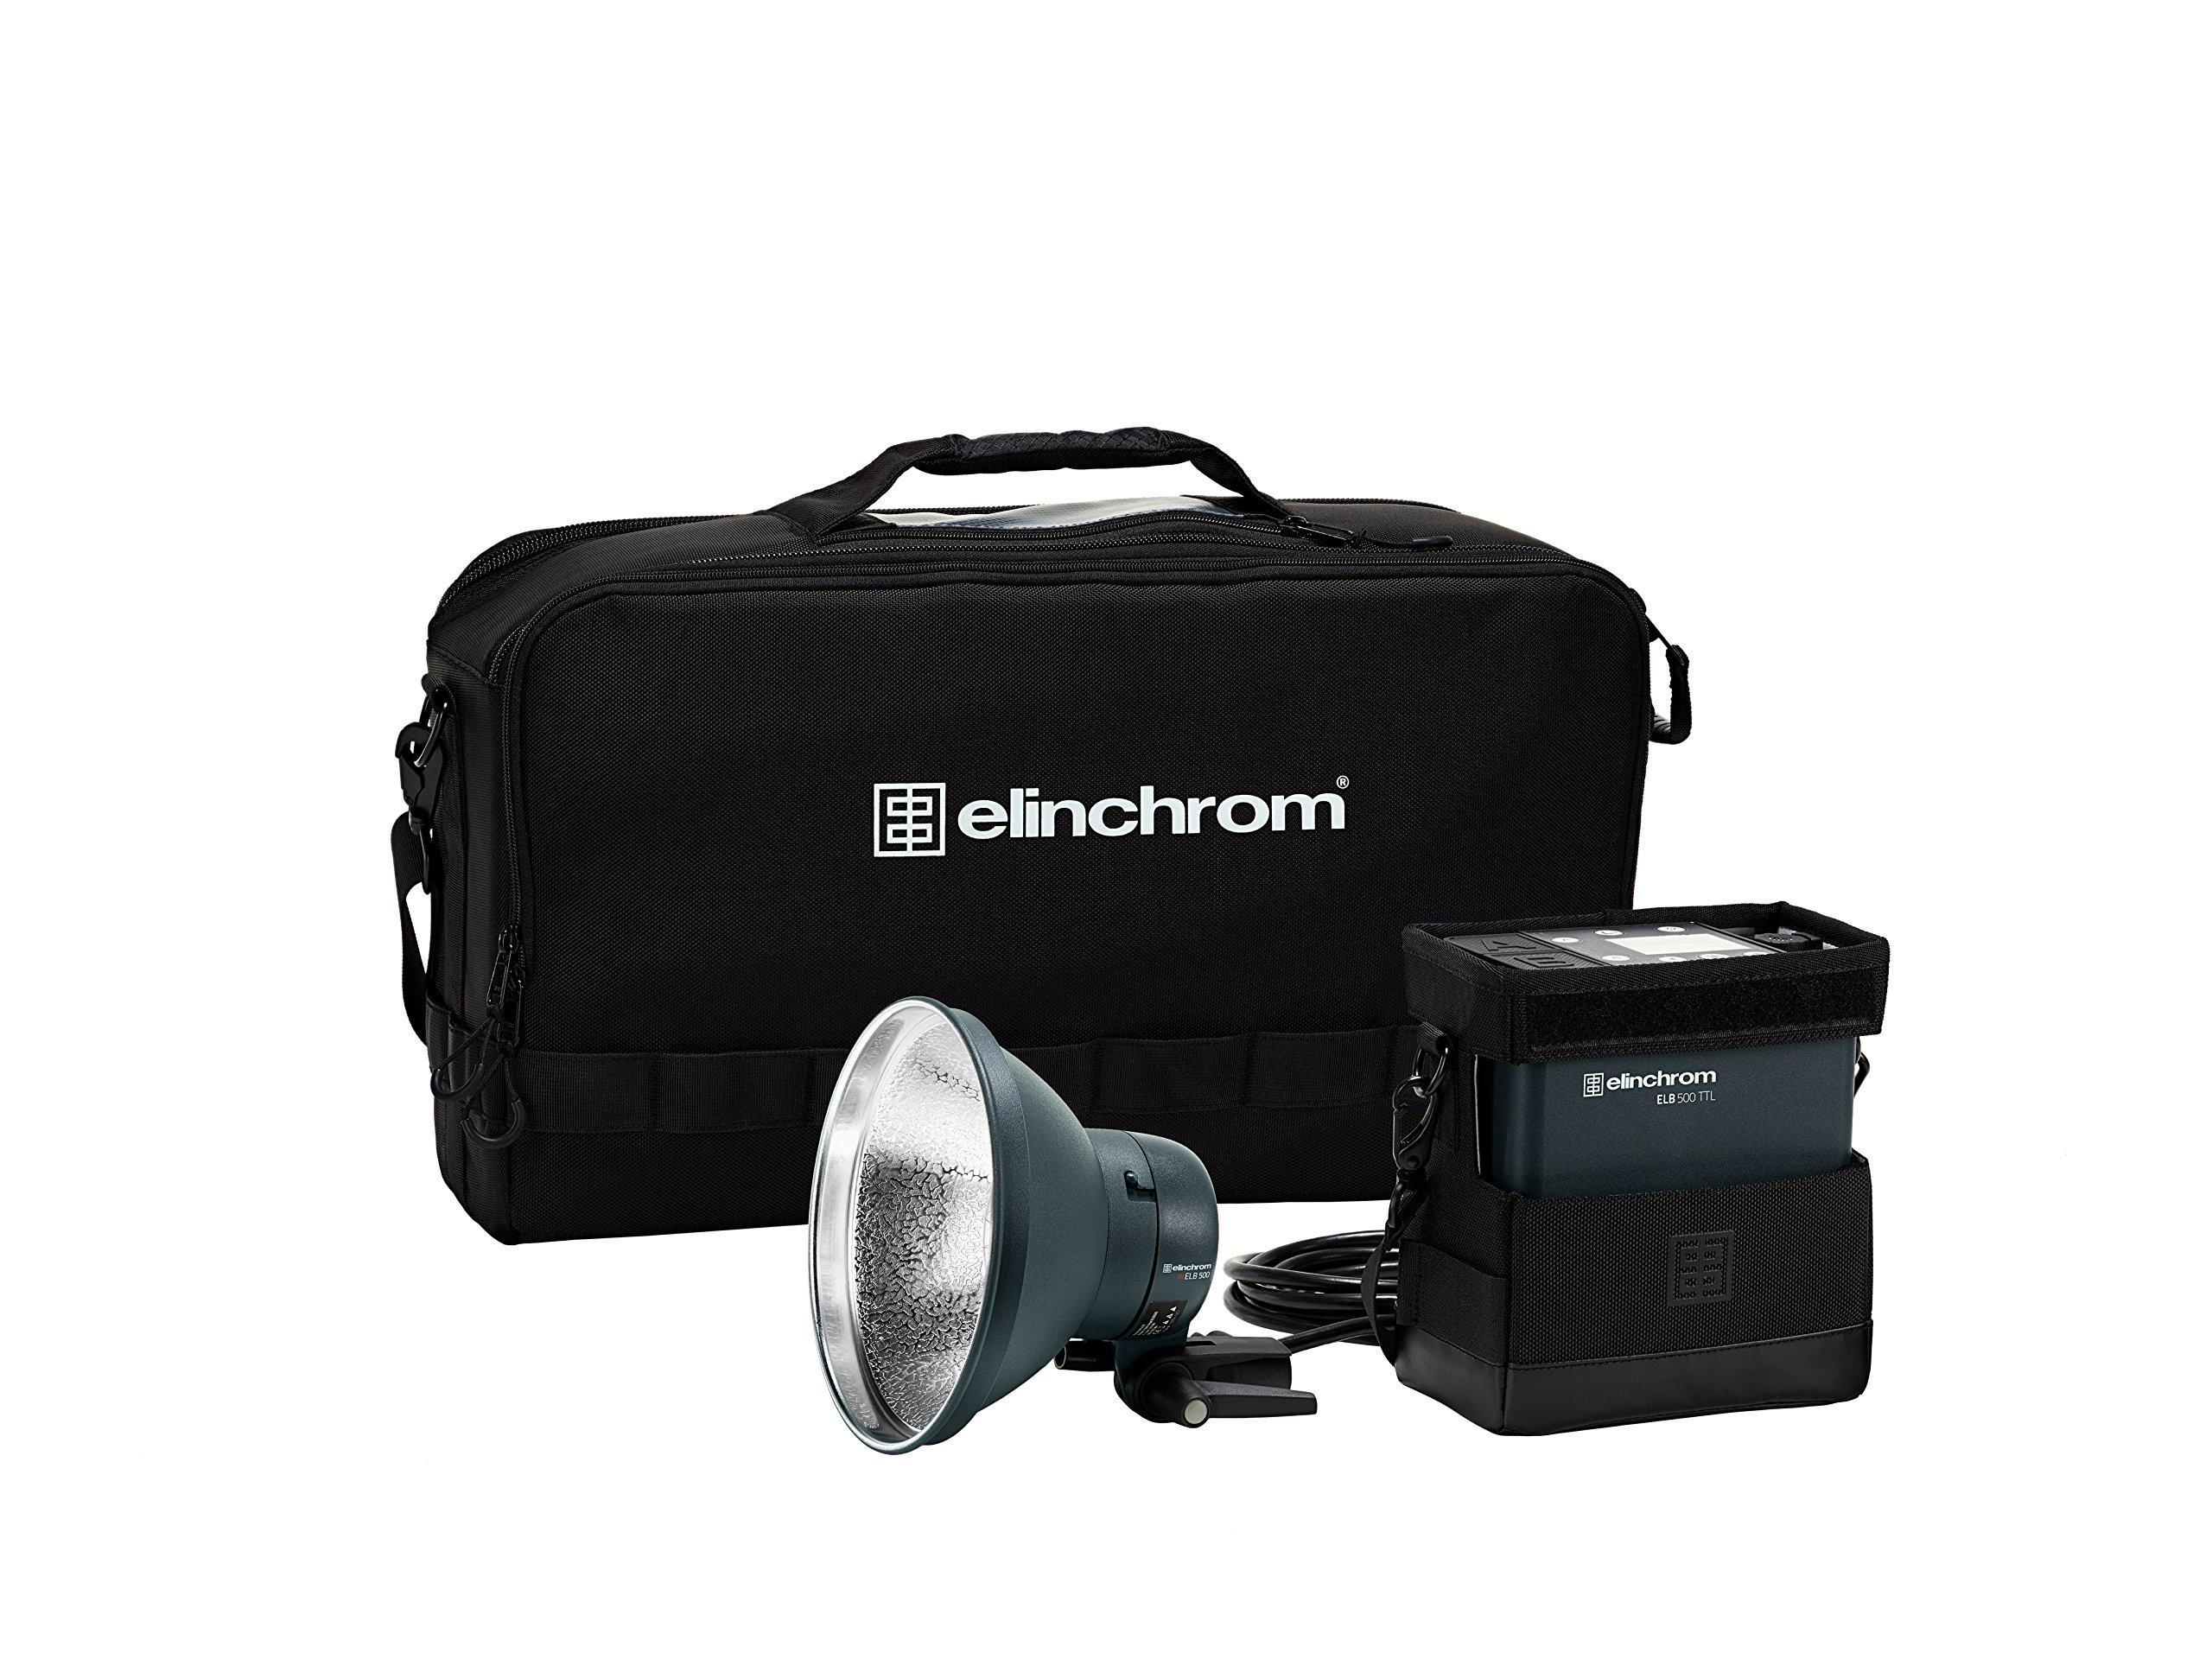 Elinchrom ELB 500 TTL Dual To Go Kit (EL10310.1)